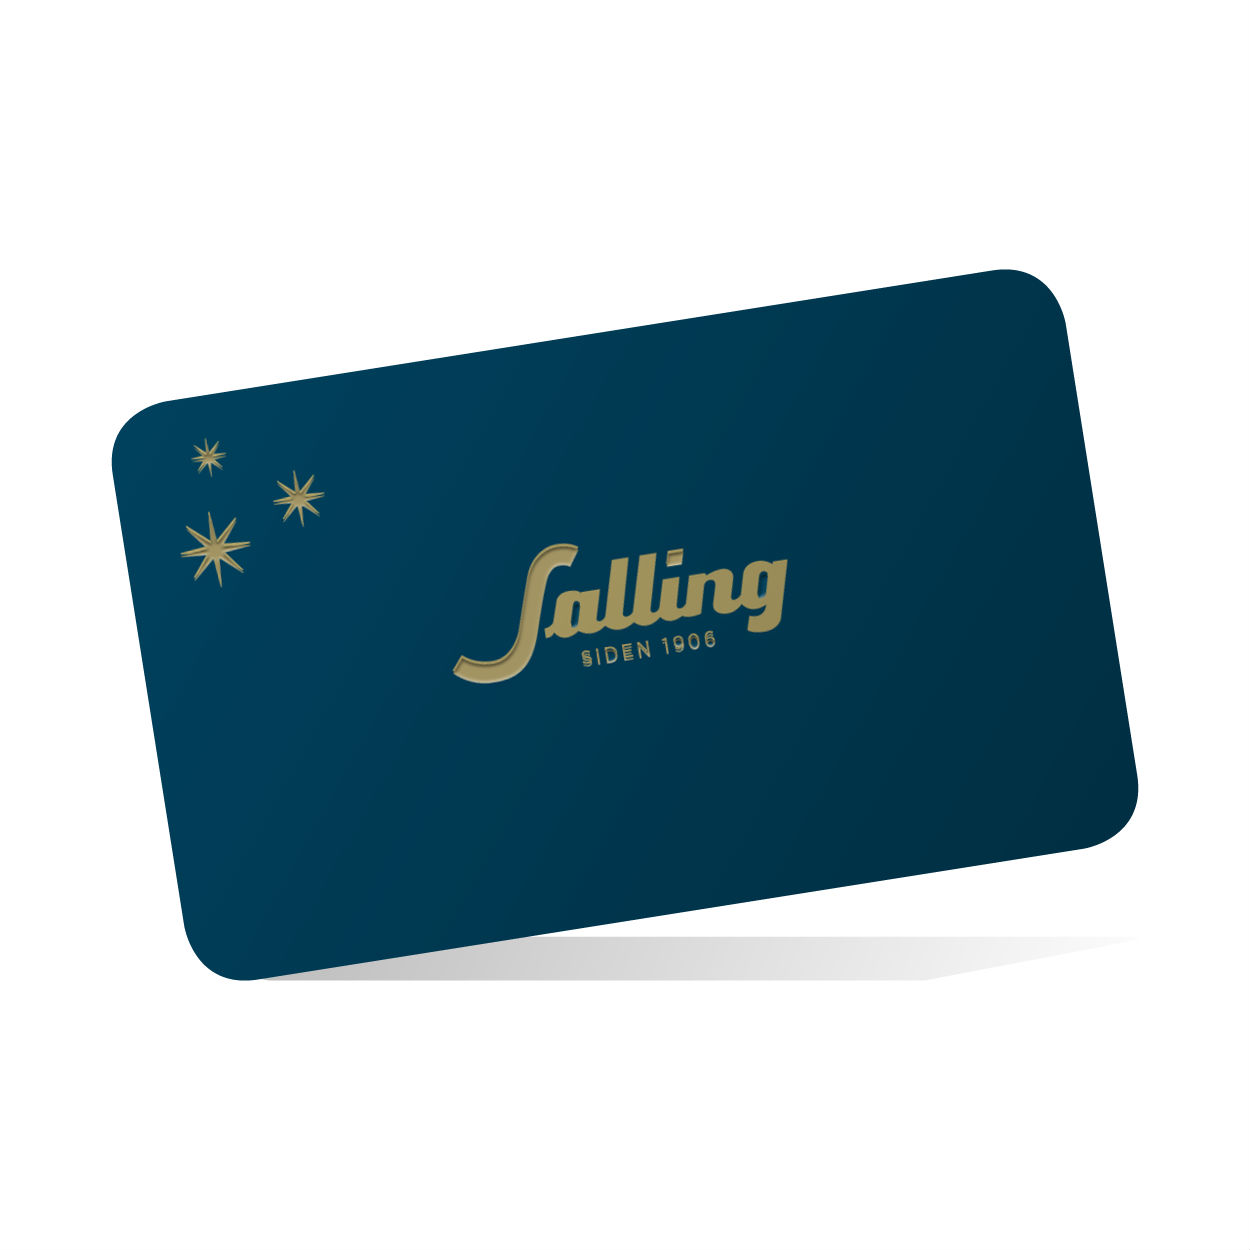 Salling gavekort - 700 kr